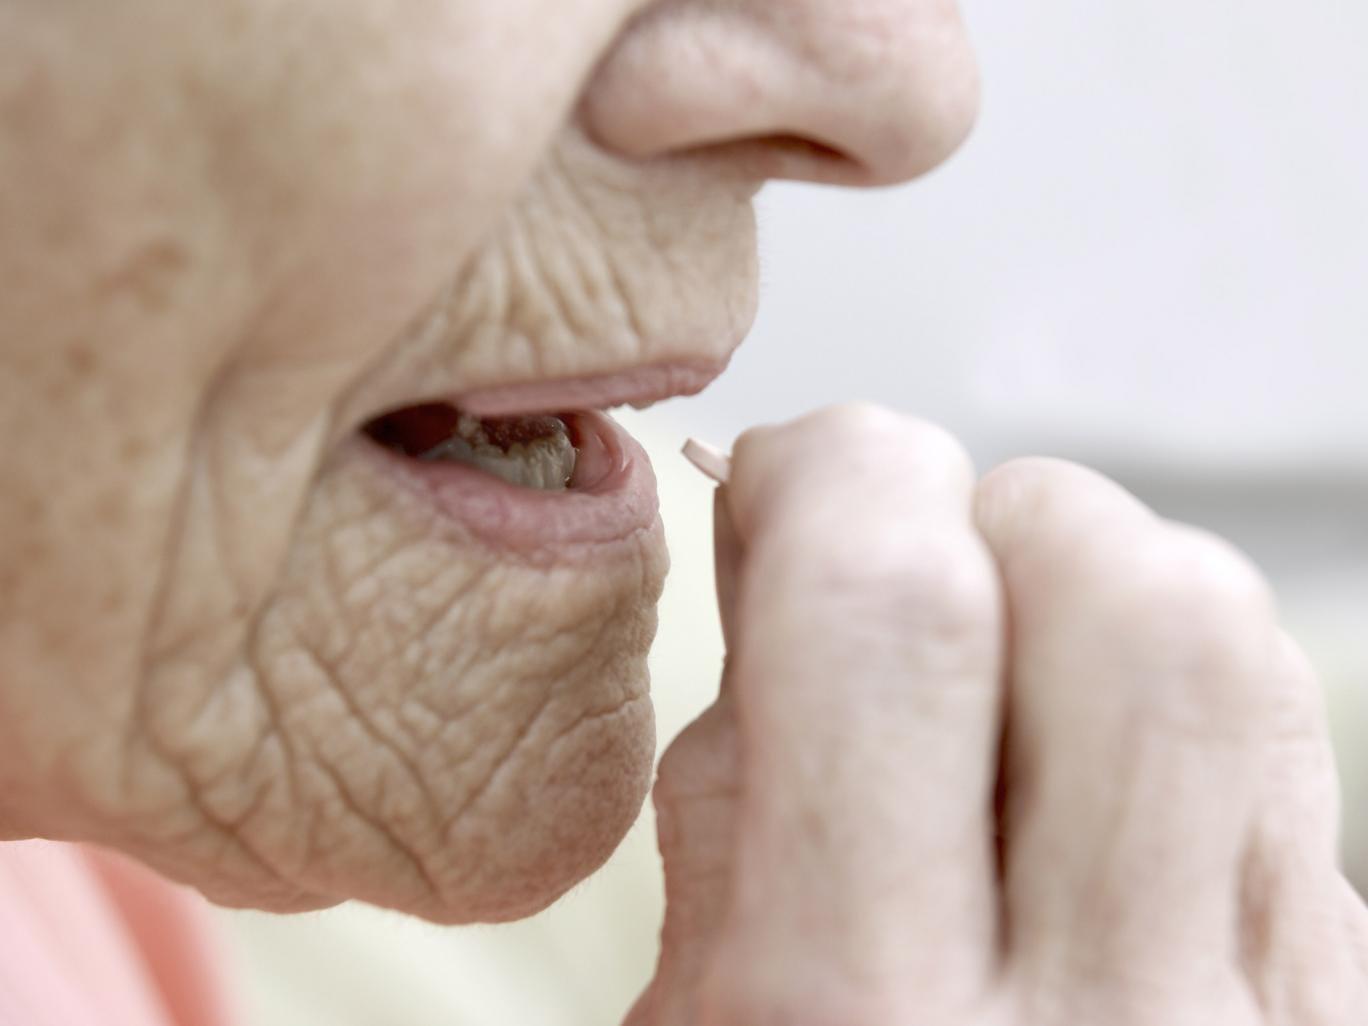 An elderly woman takes statin medication